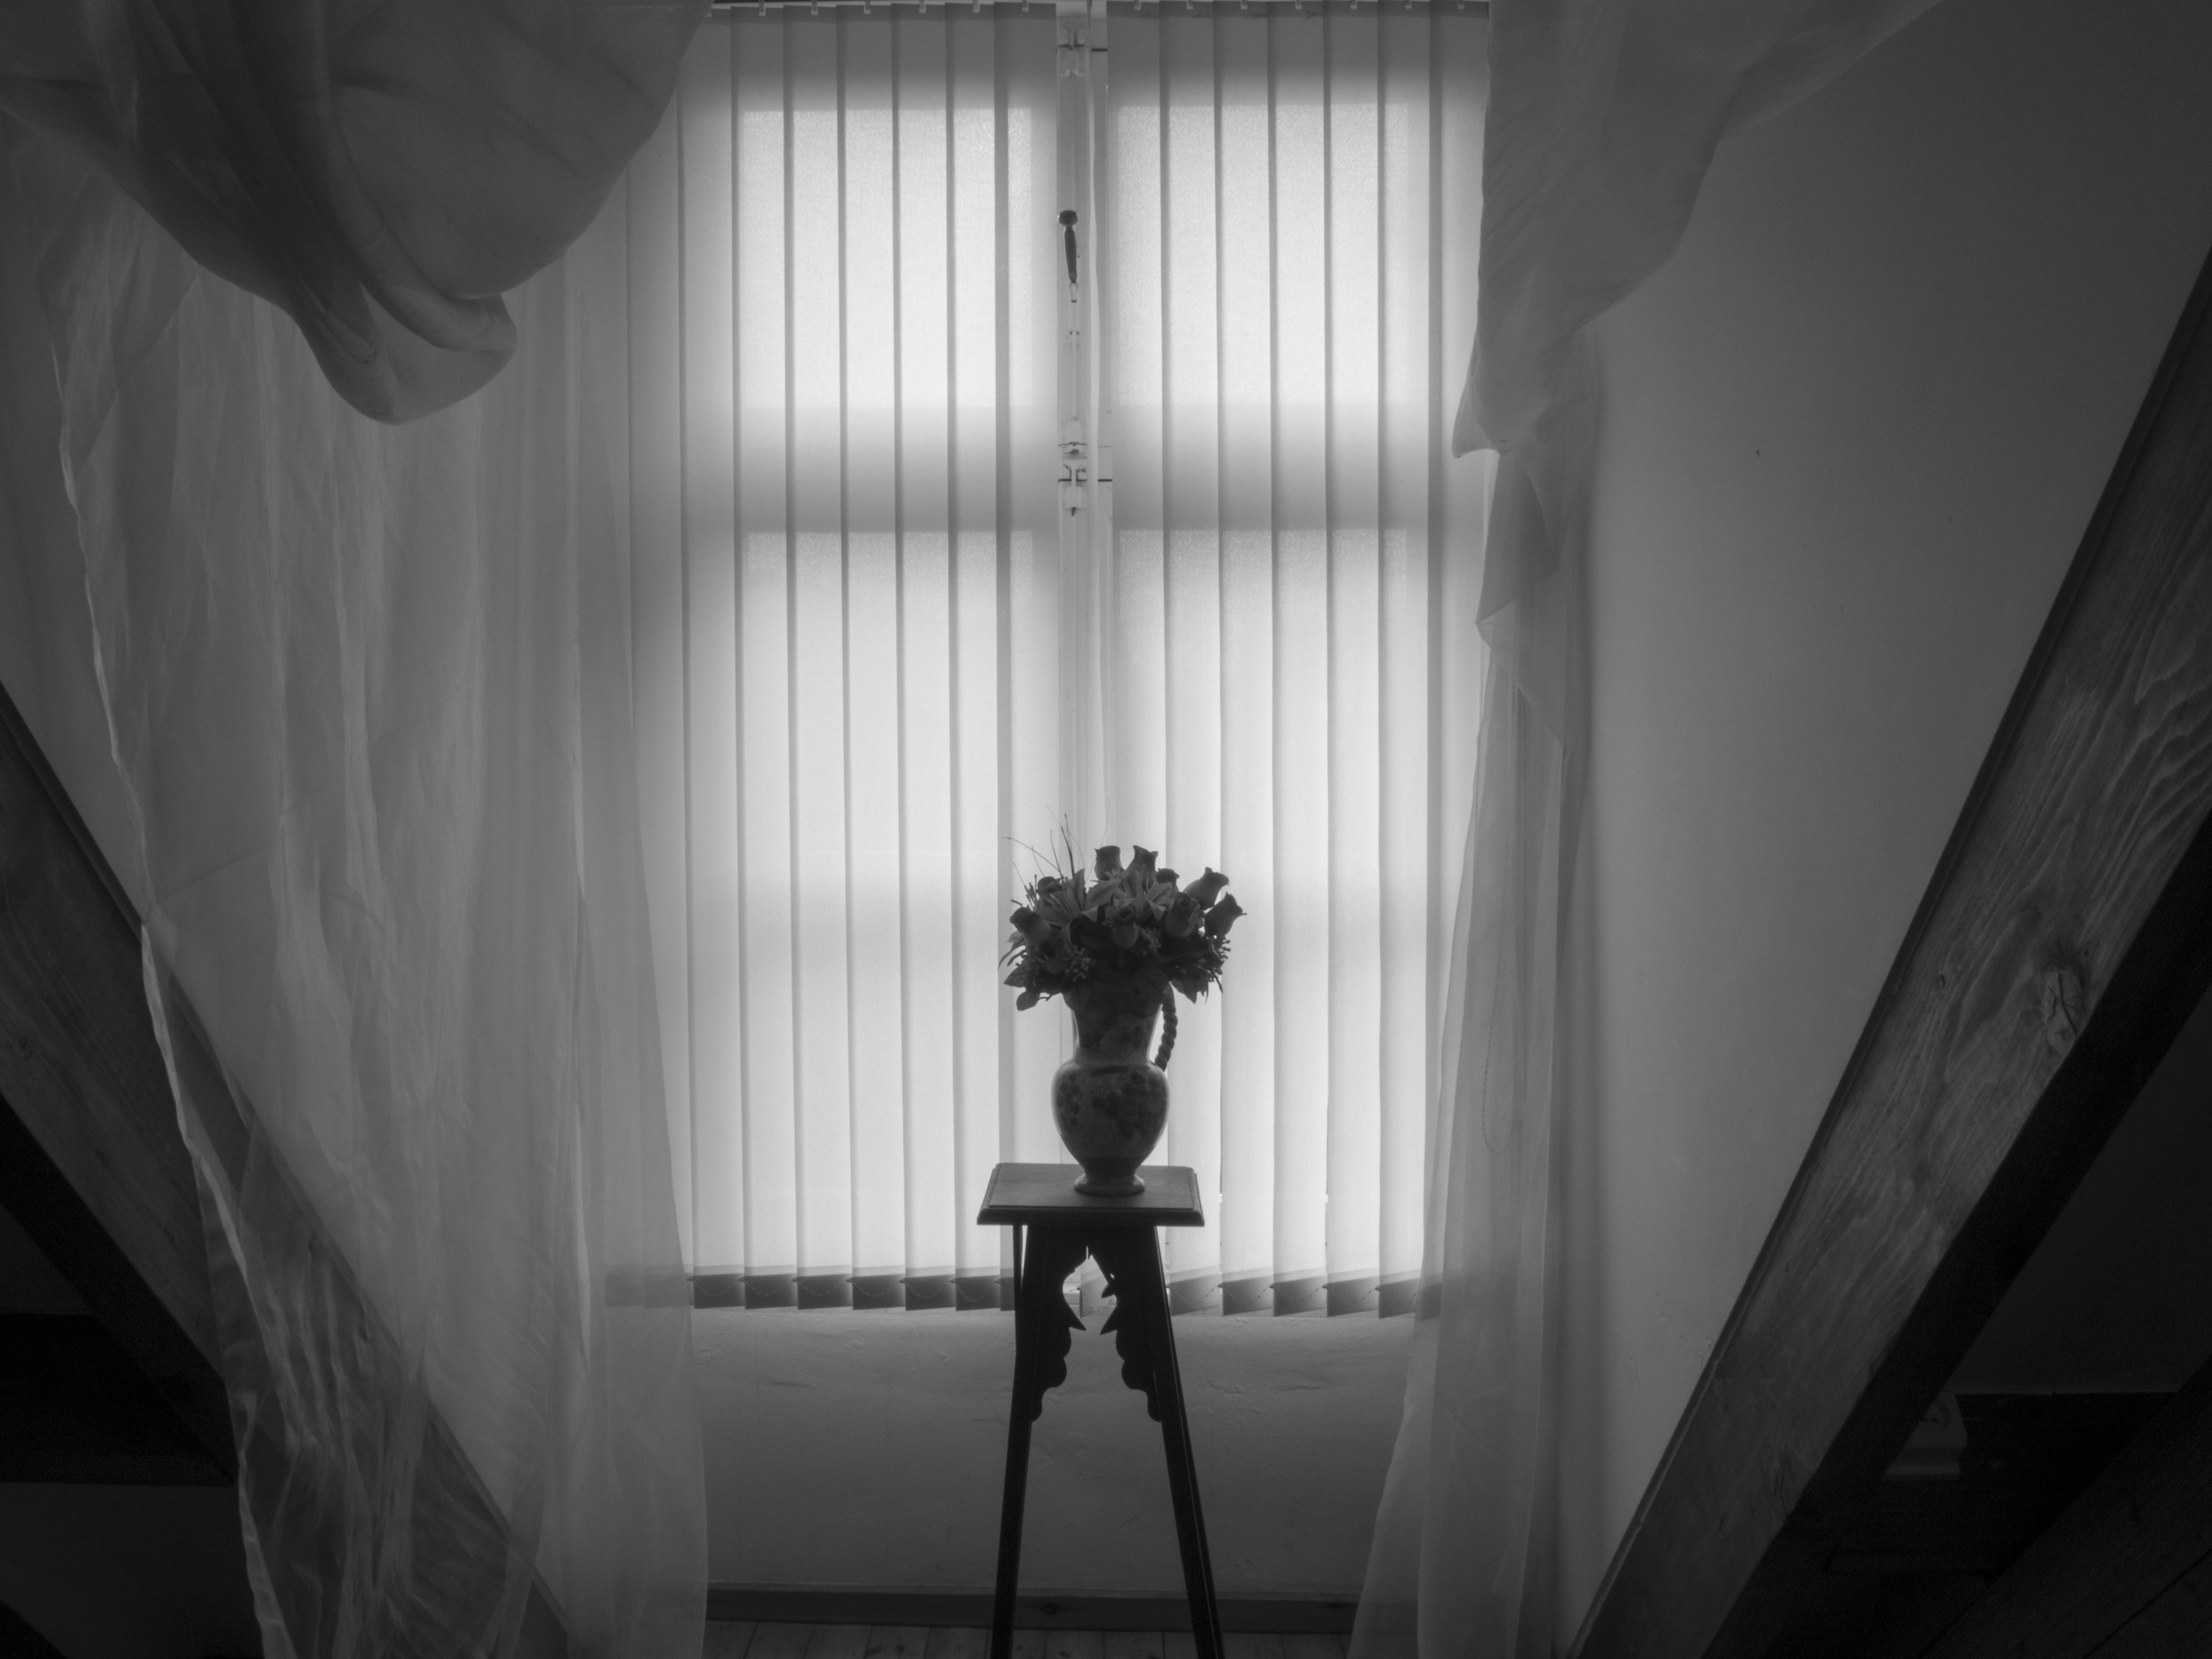 Free Images Blackandwhite Flowers Dramatic Photograph Black